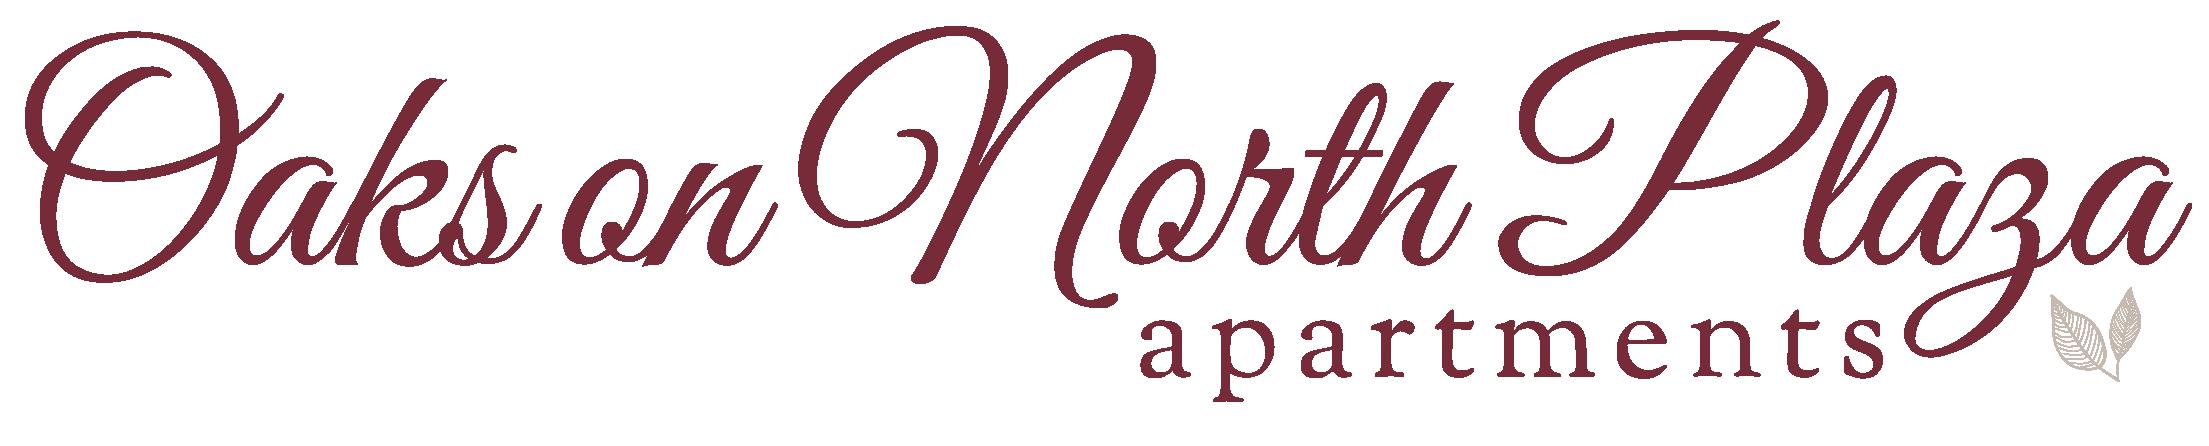 Oaks on North Plaza Apartments Logo